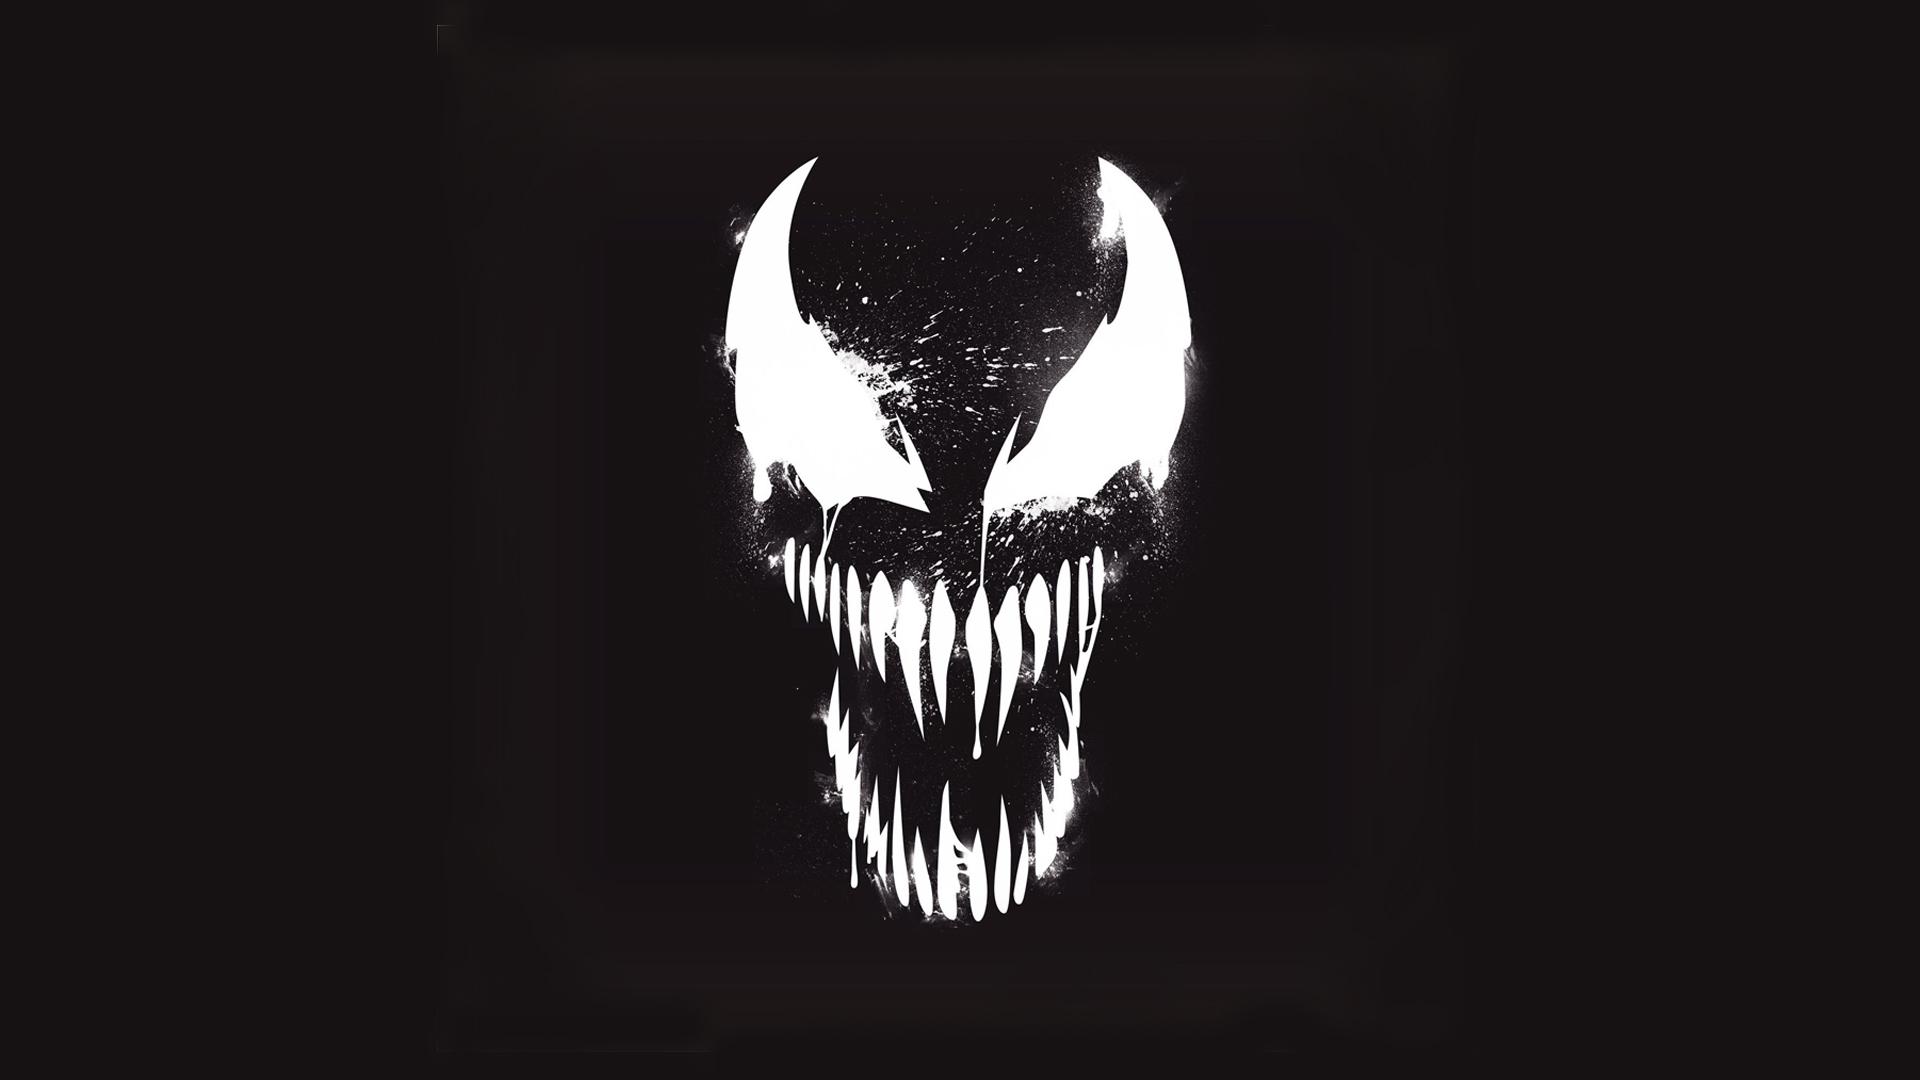 Sick Iphone Wallpapers Hd Venom Marvel Artistic Logo With Dark Background Hd